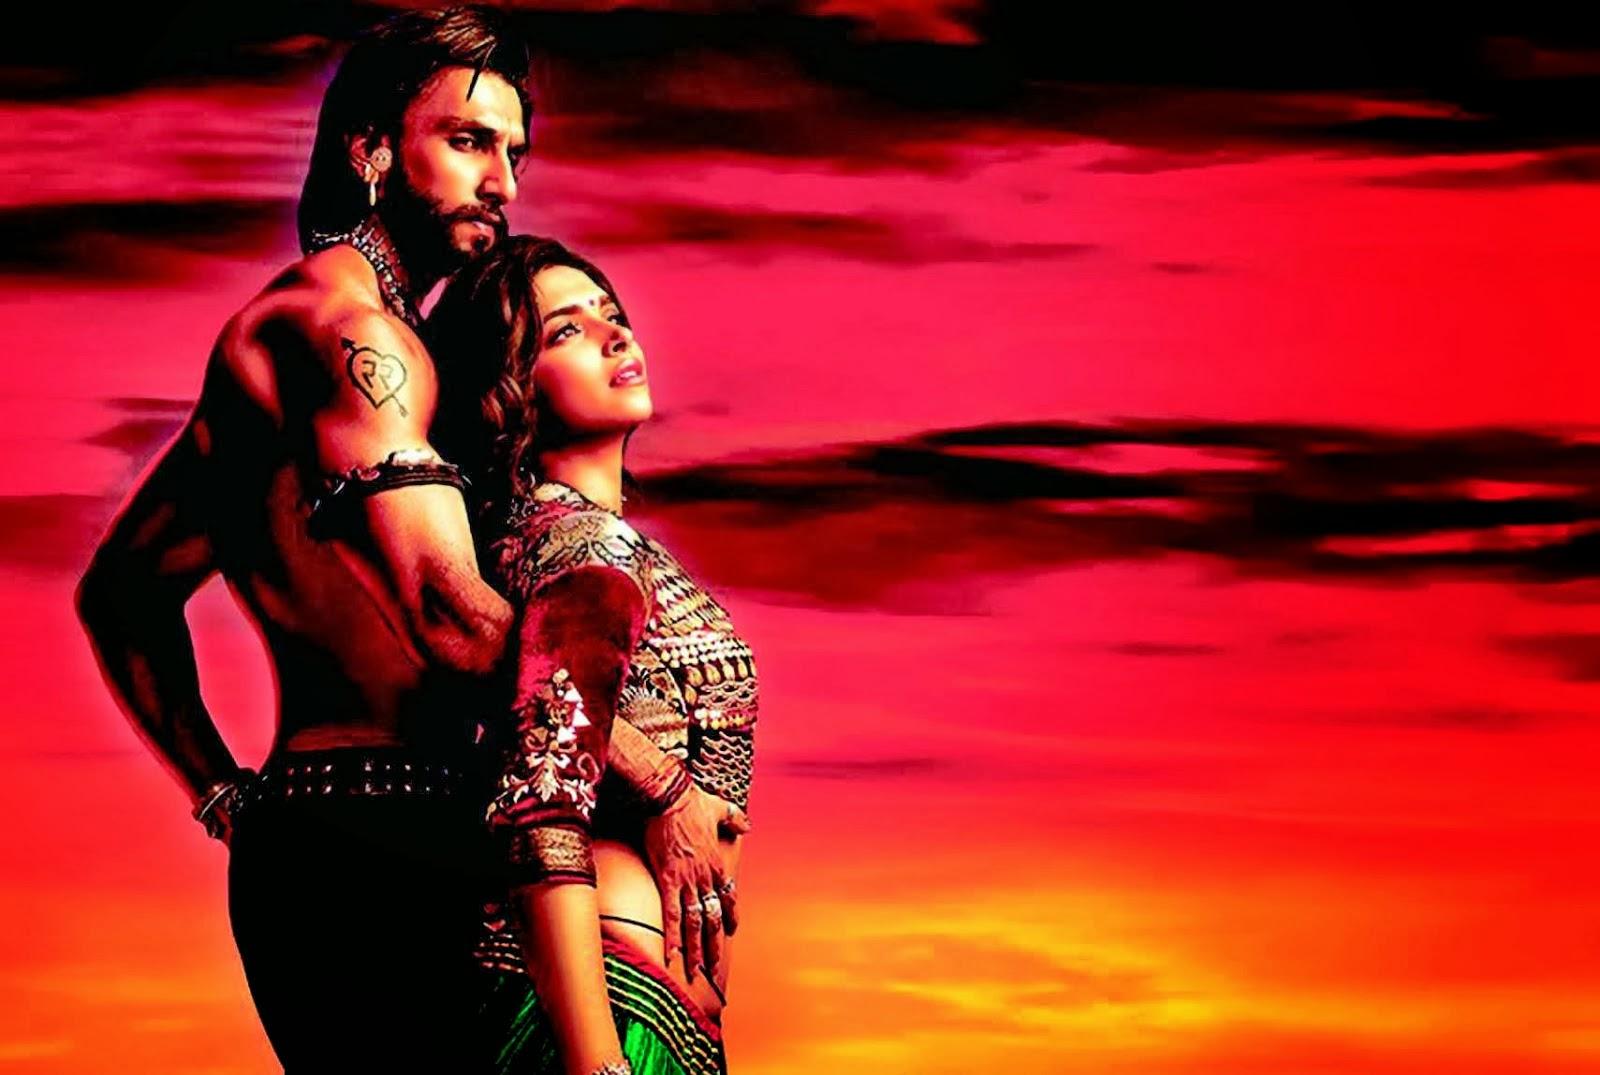 Lovely couples free hd wallpaper download deepika - Ranveer singh hd wallpaper padmavati ...